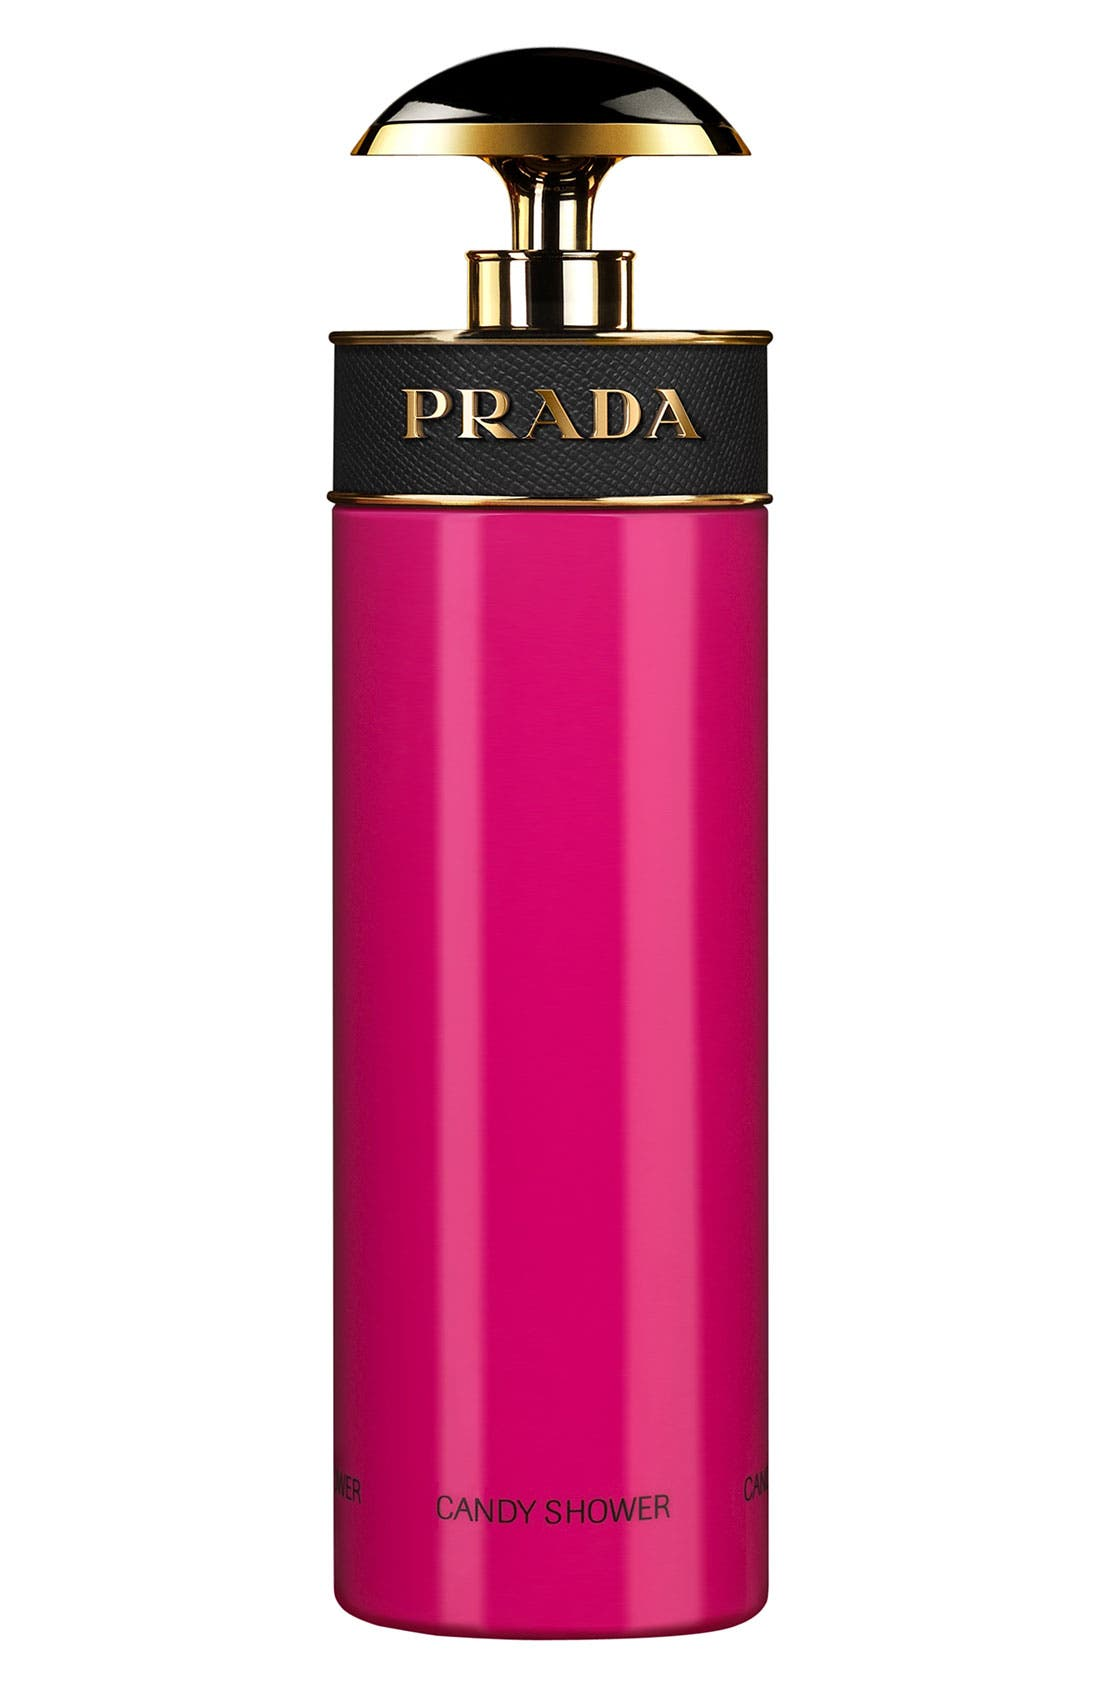 Prada 'Candy' Shower Gel